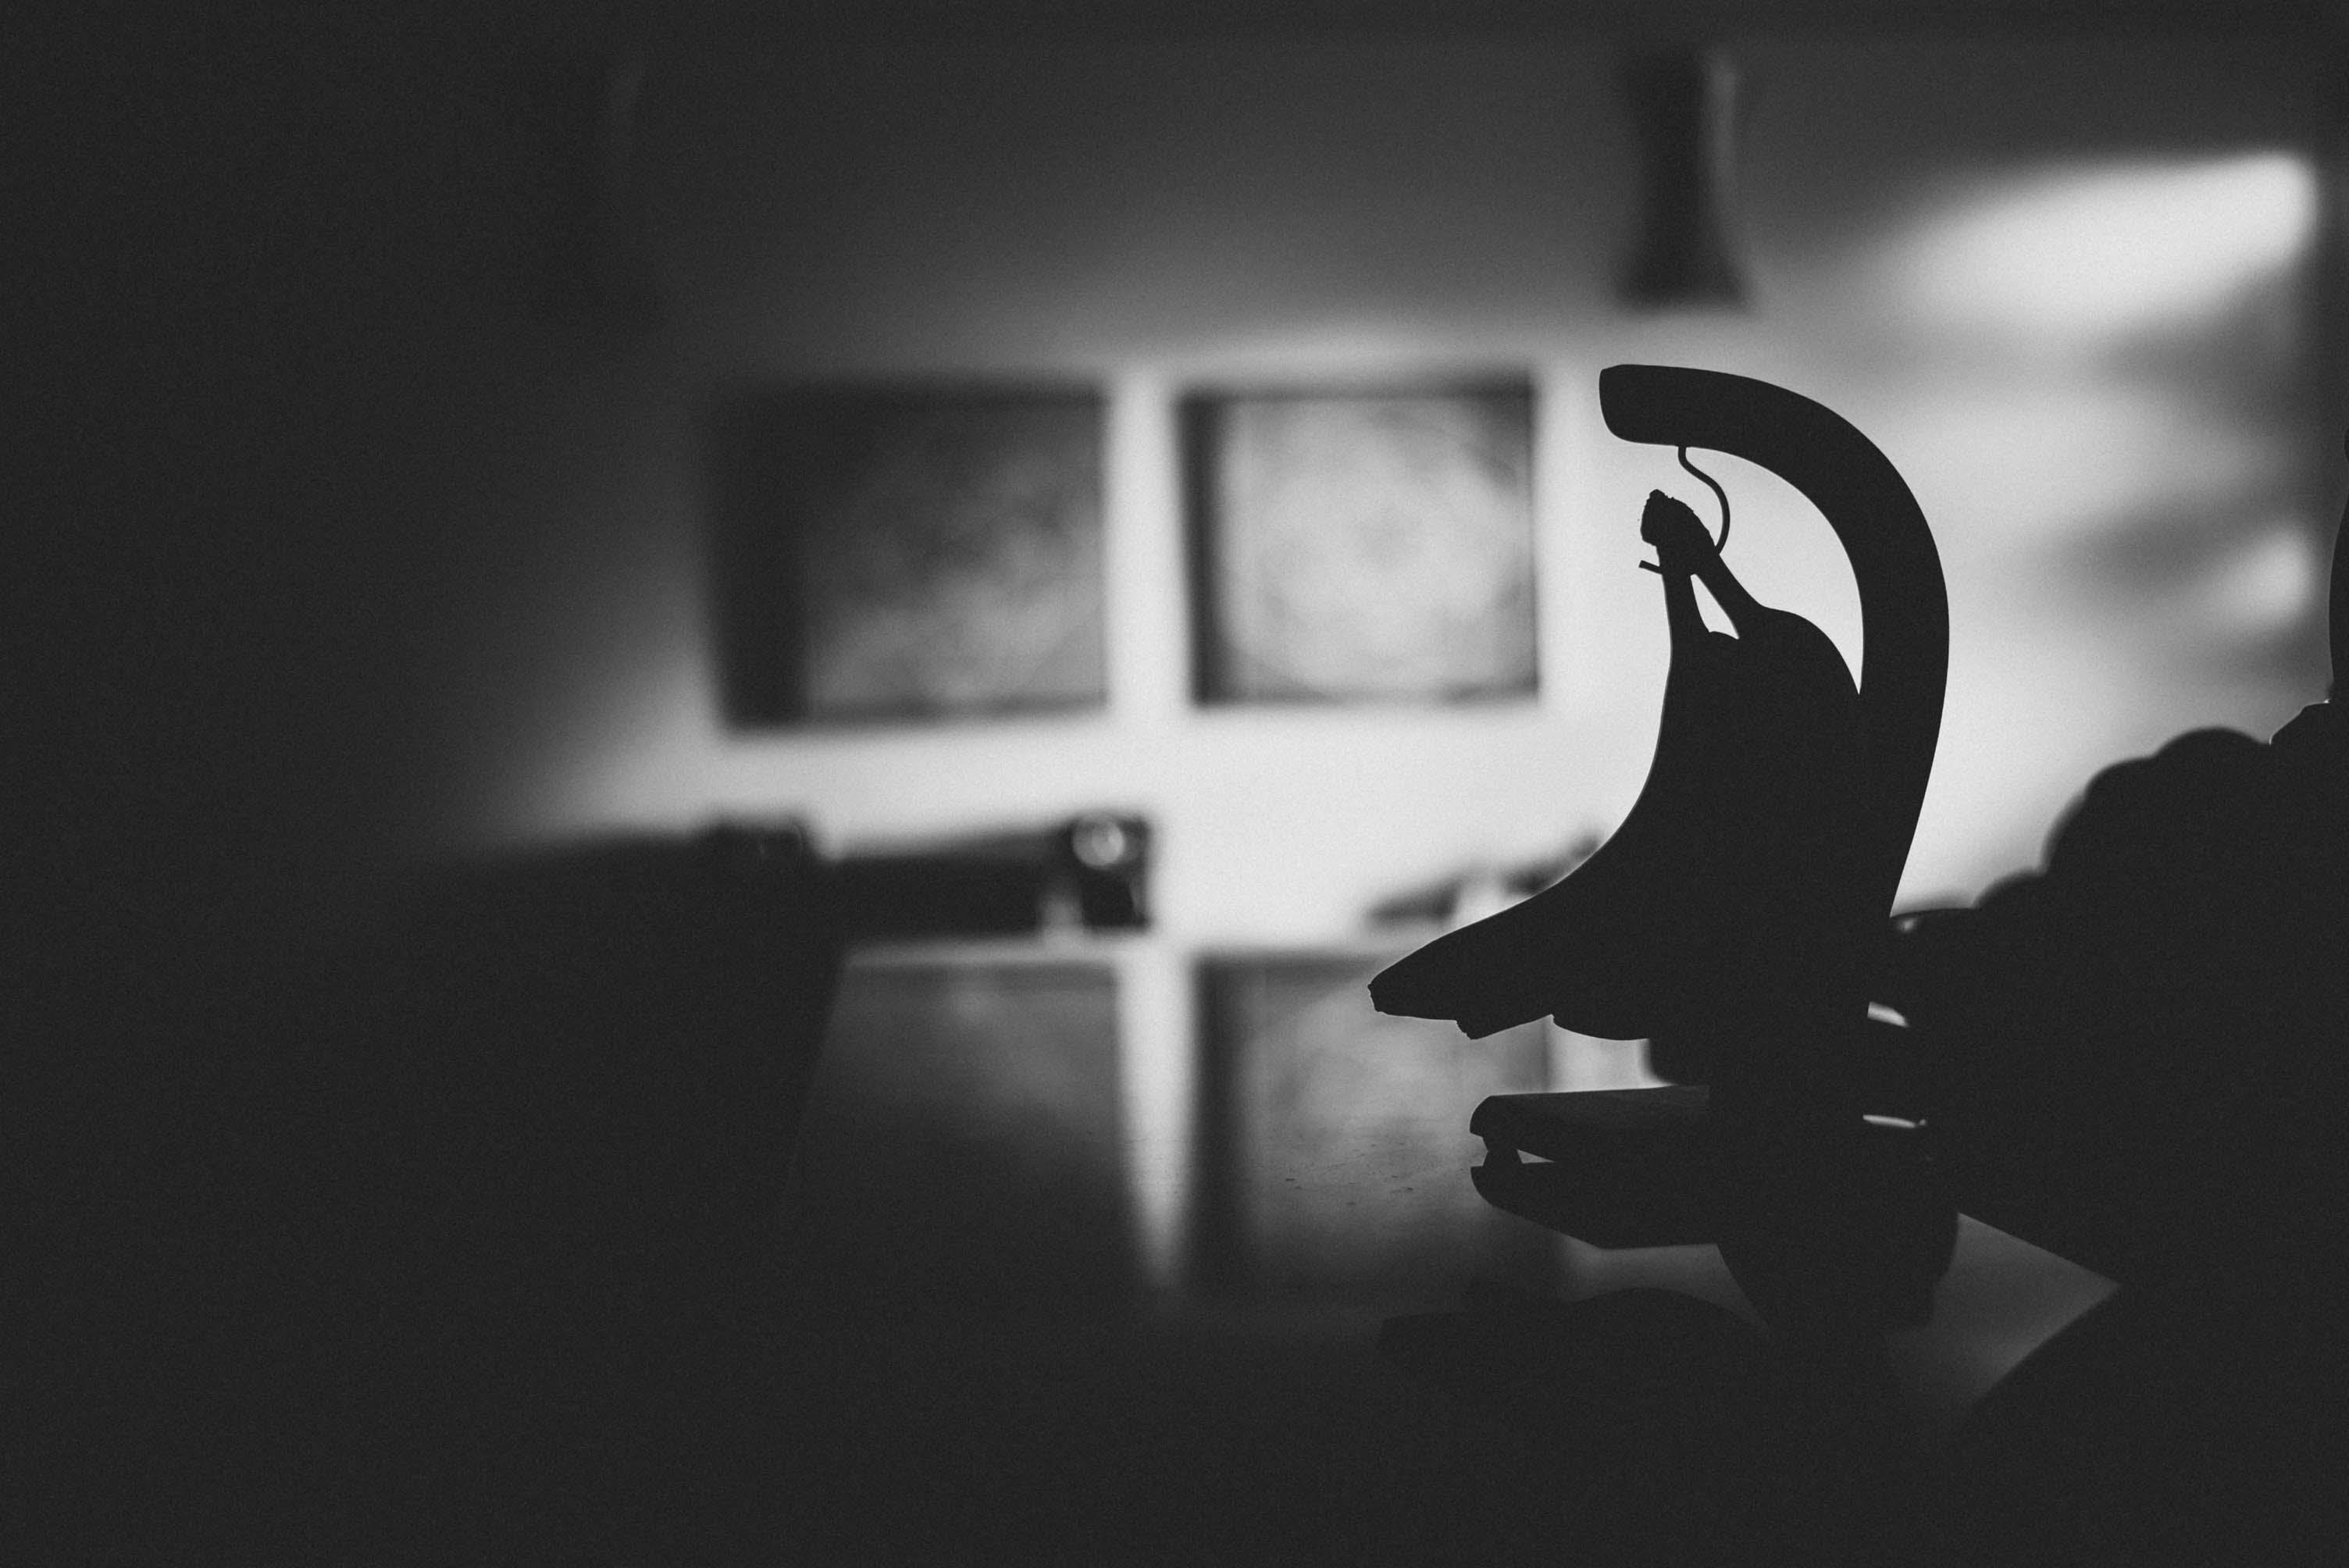 Silhouette Photography of Banana Hook Decor